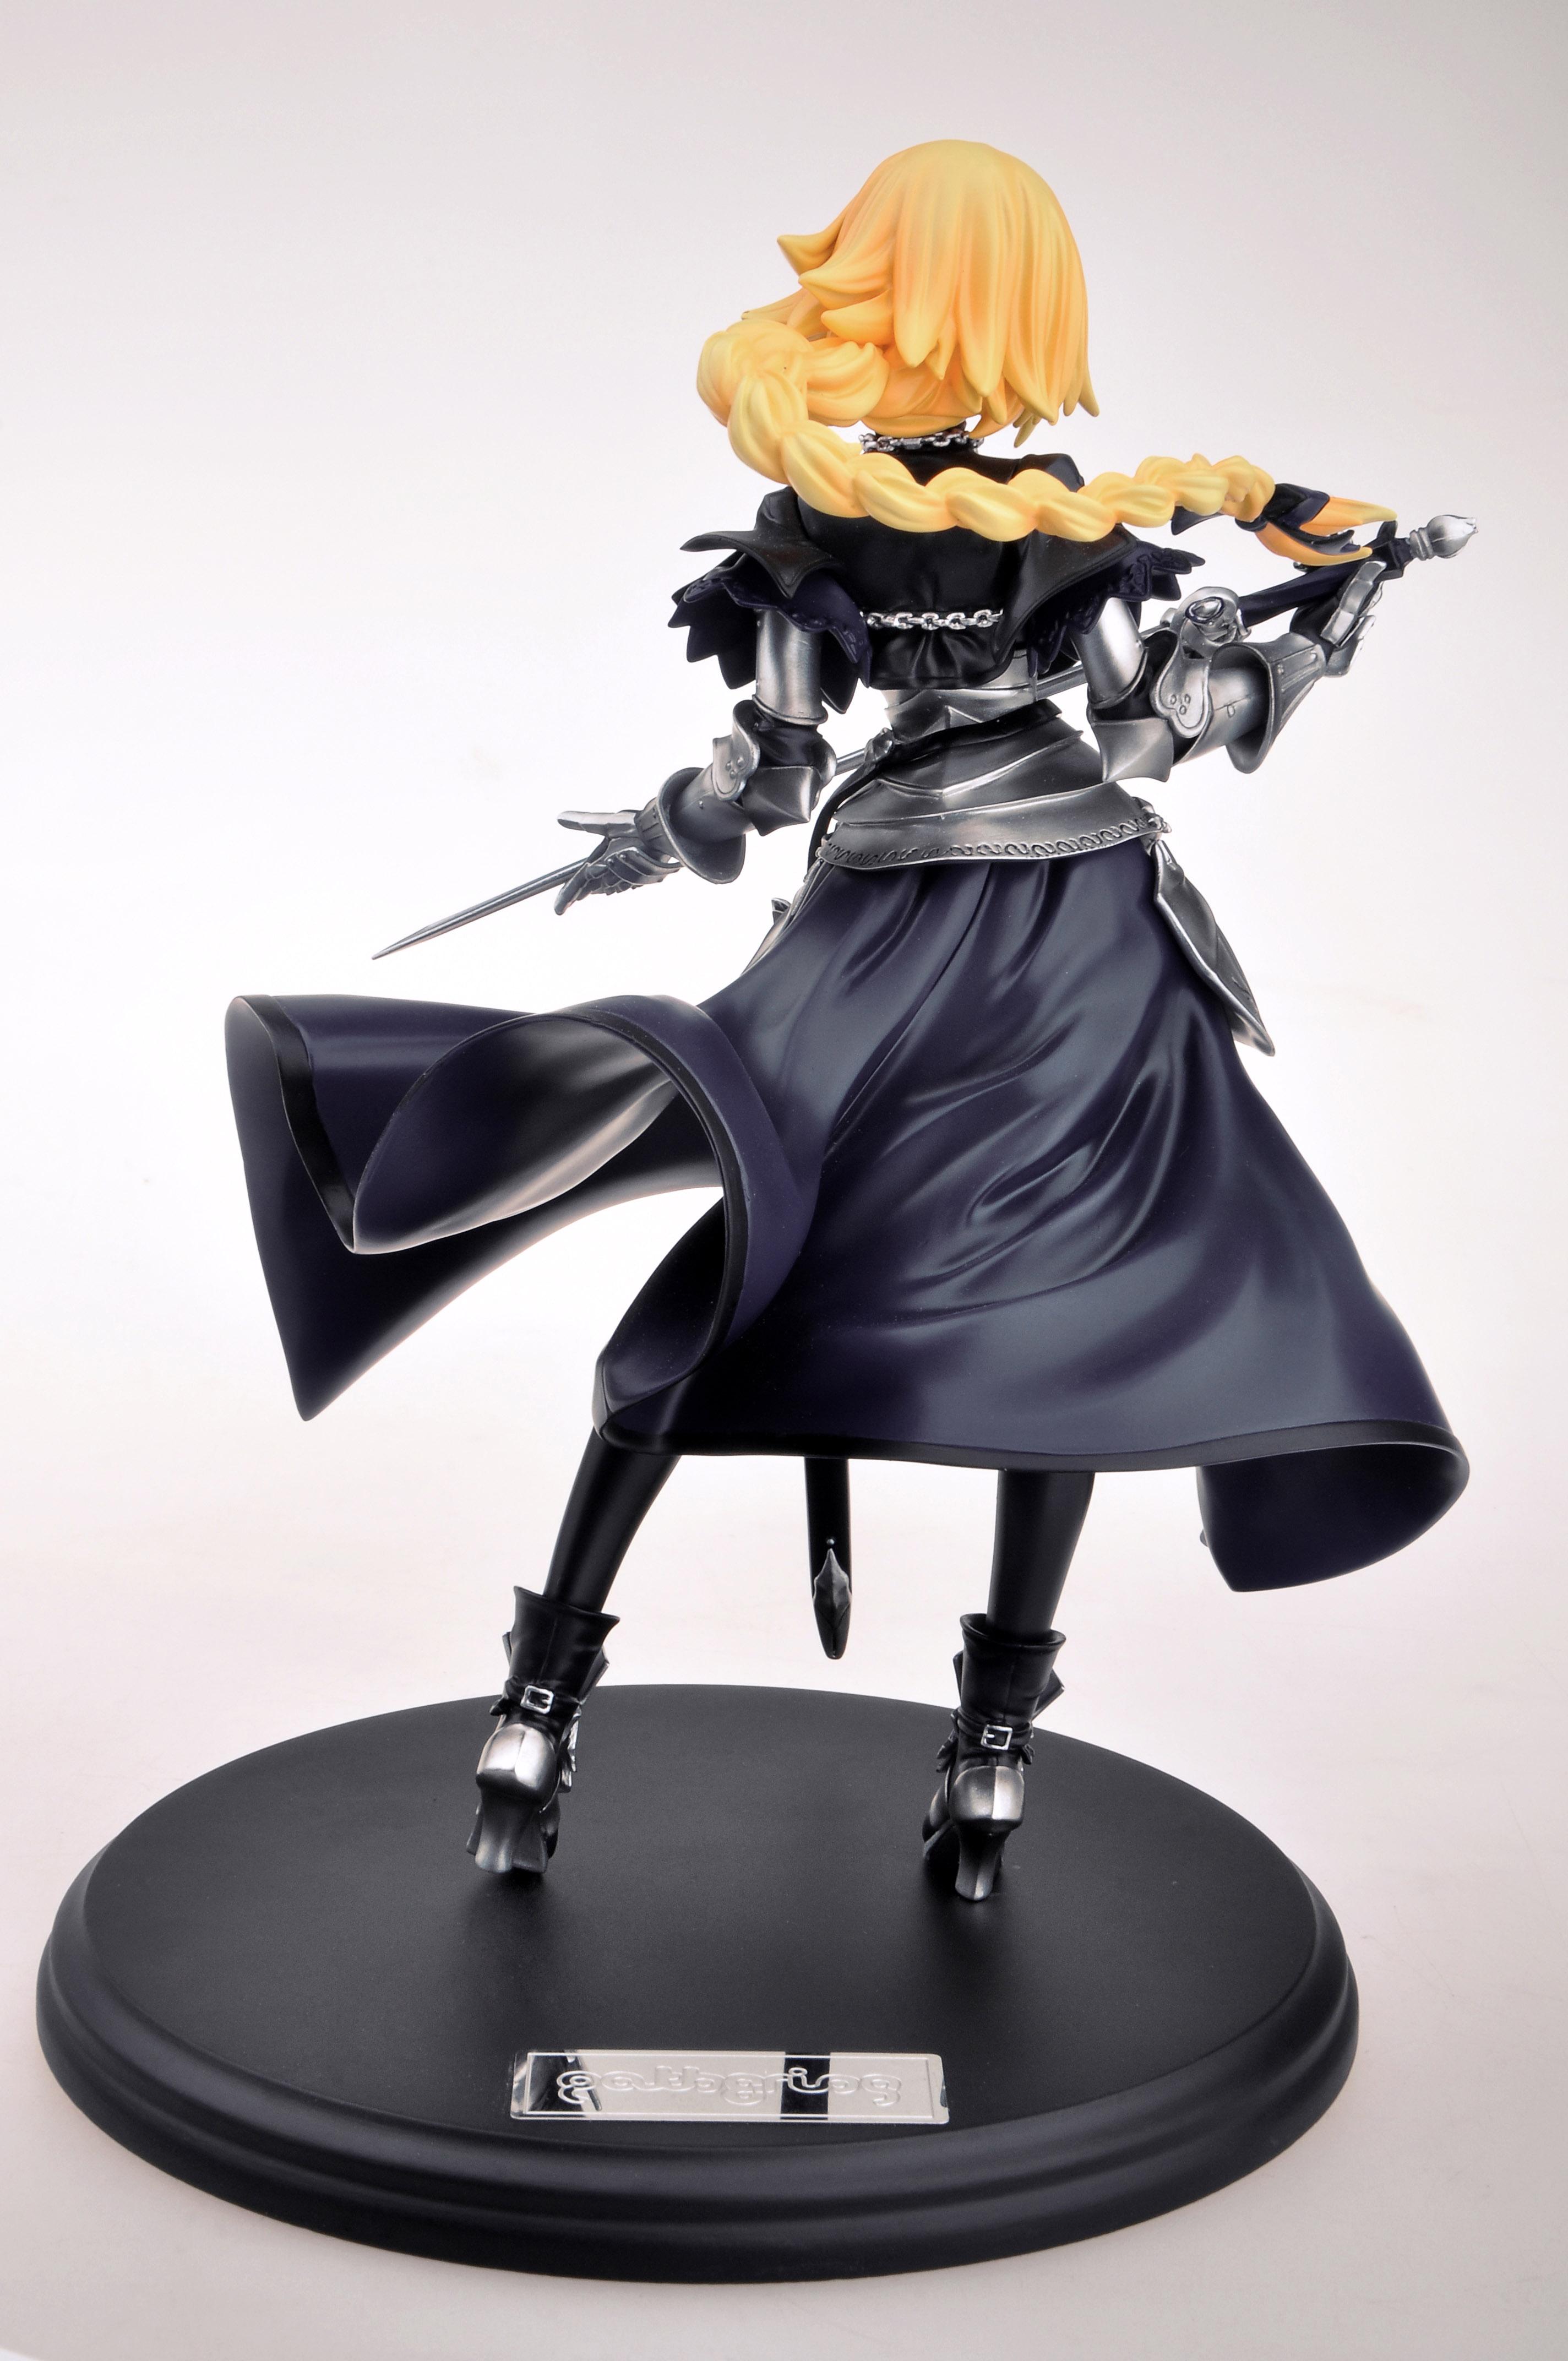 Fate Series Jeanne Ruler prepainted figure haruhichan.com Fate Stay Night anime figure Ruler Joan of Arc 09